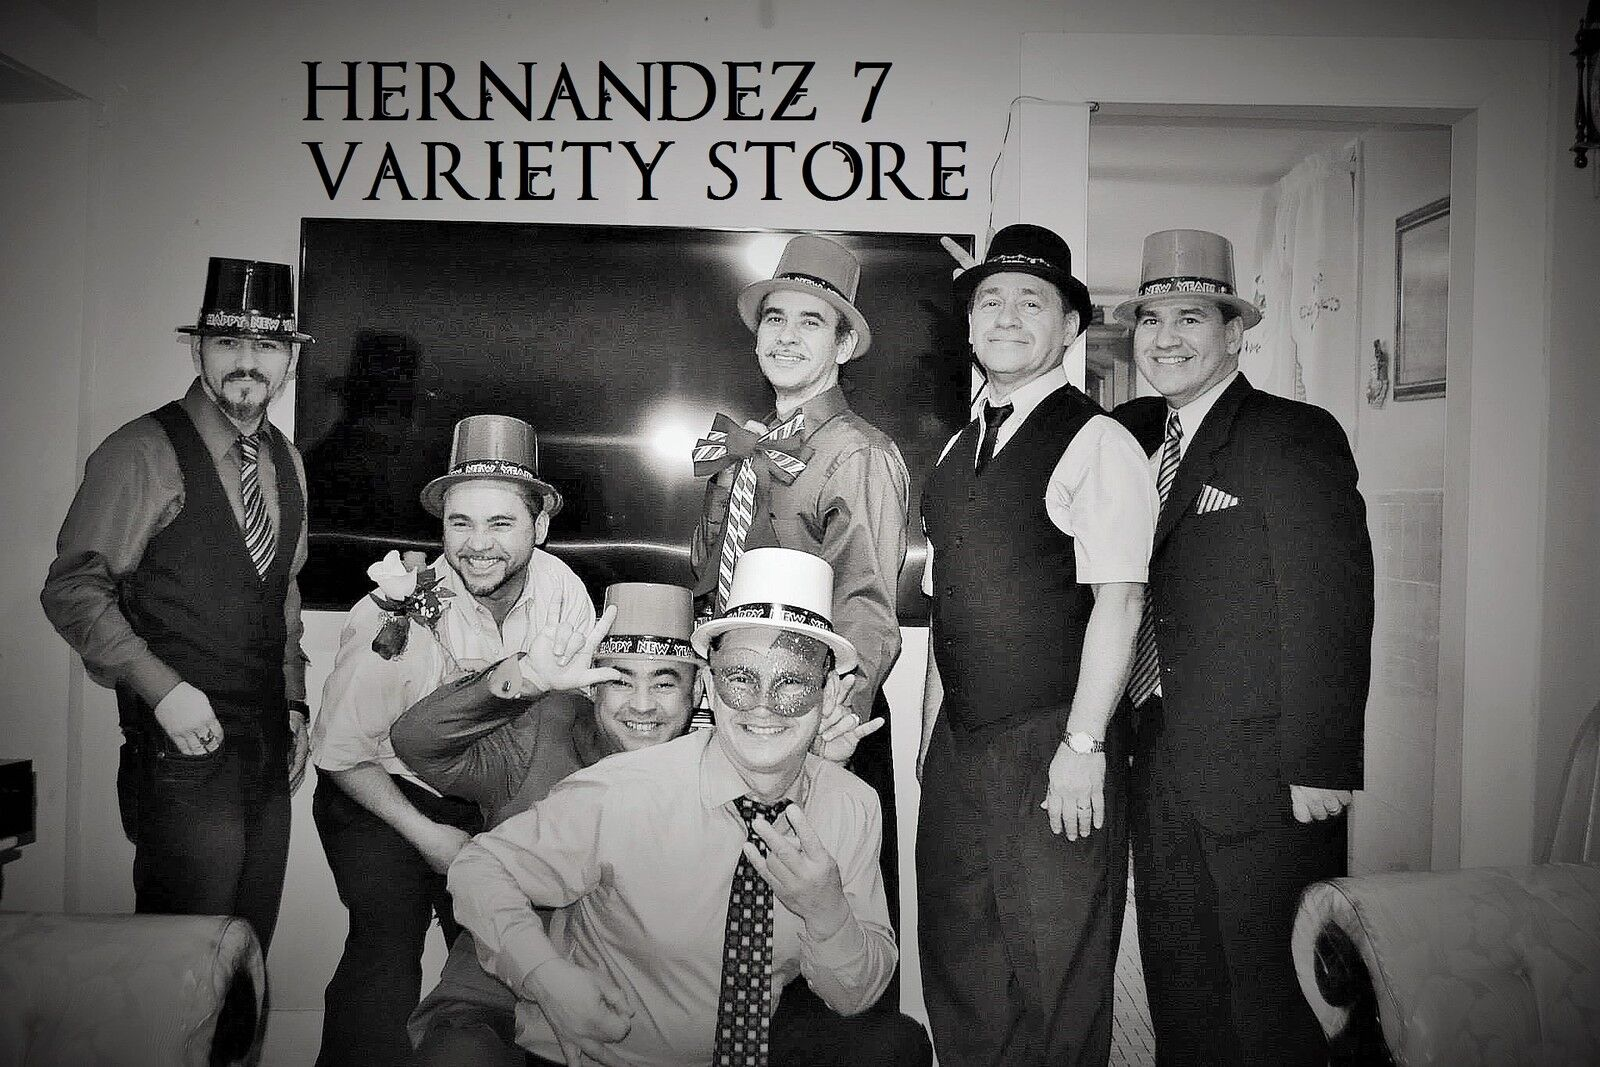 Hernandez 7 Variety